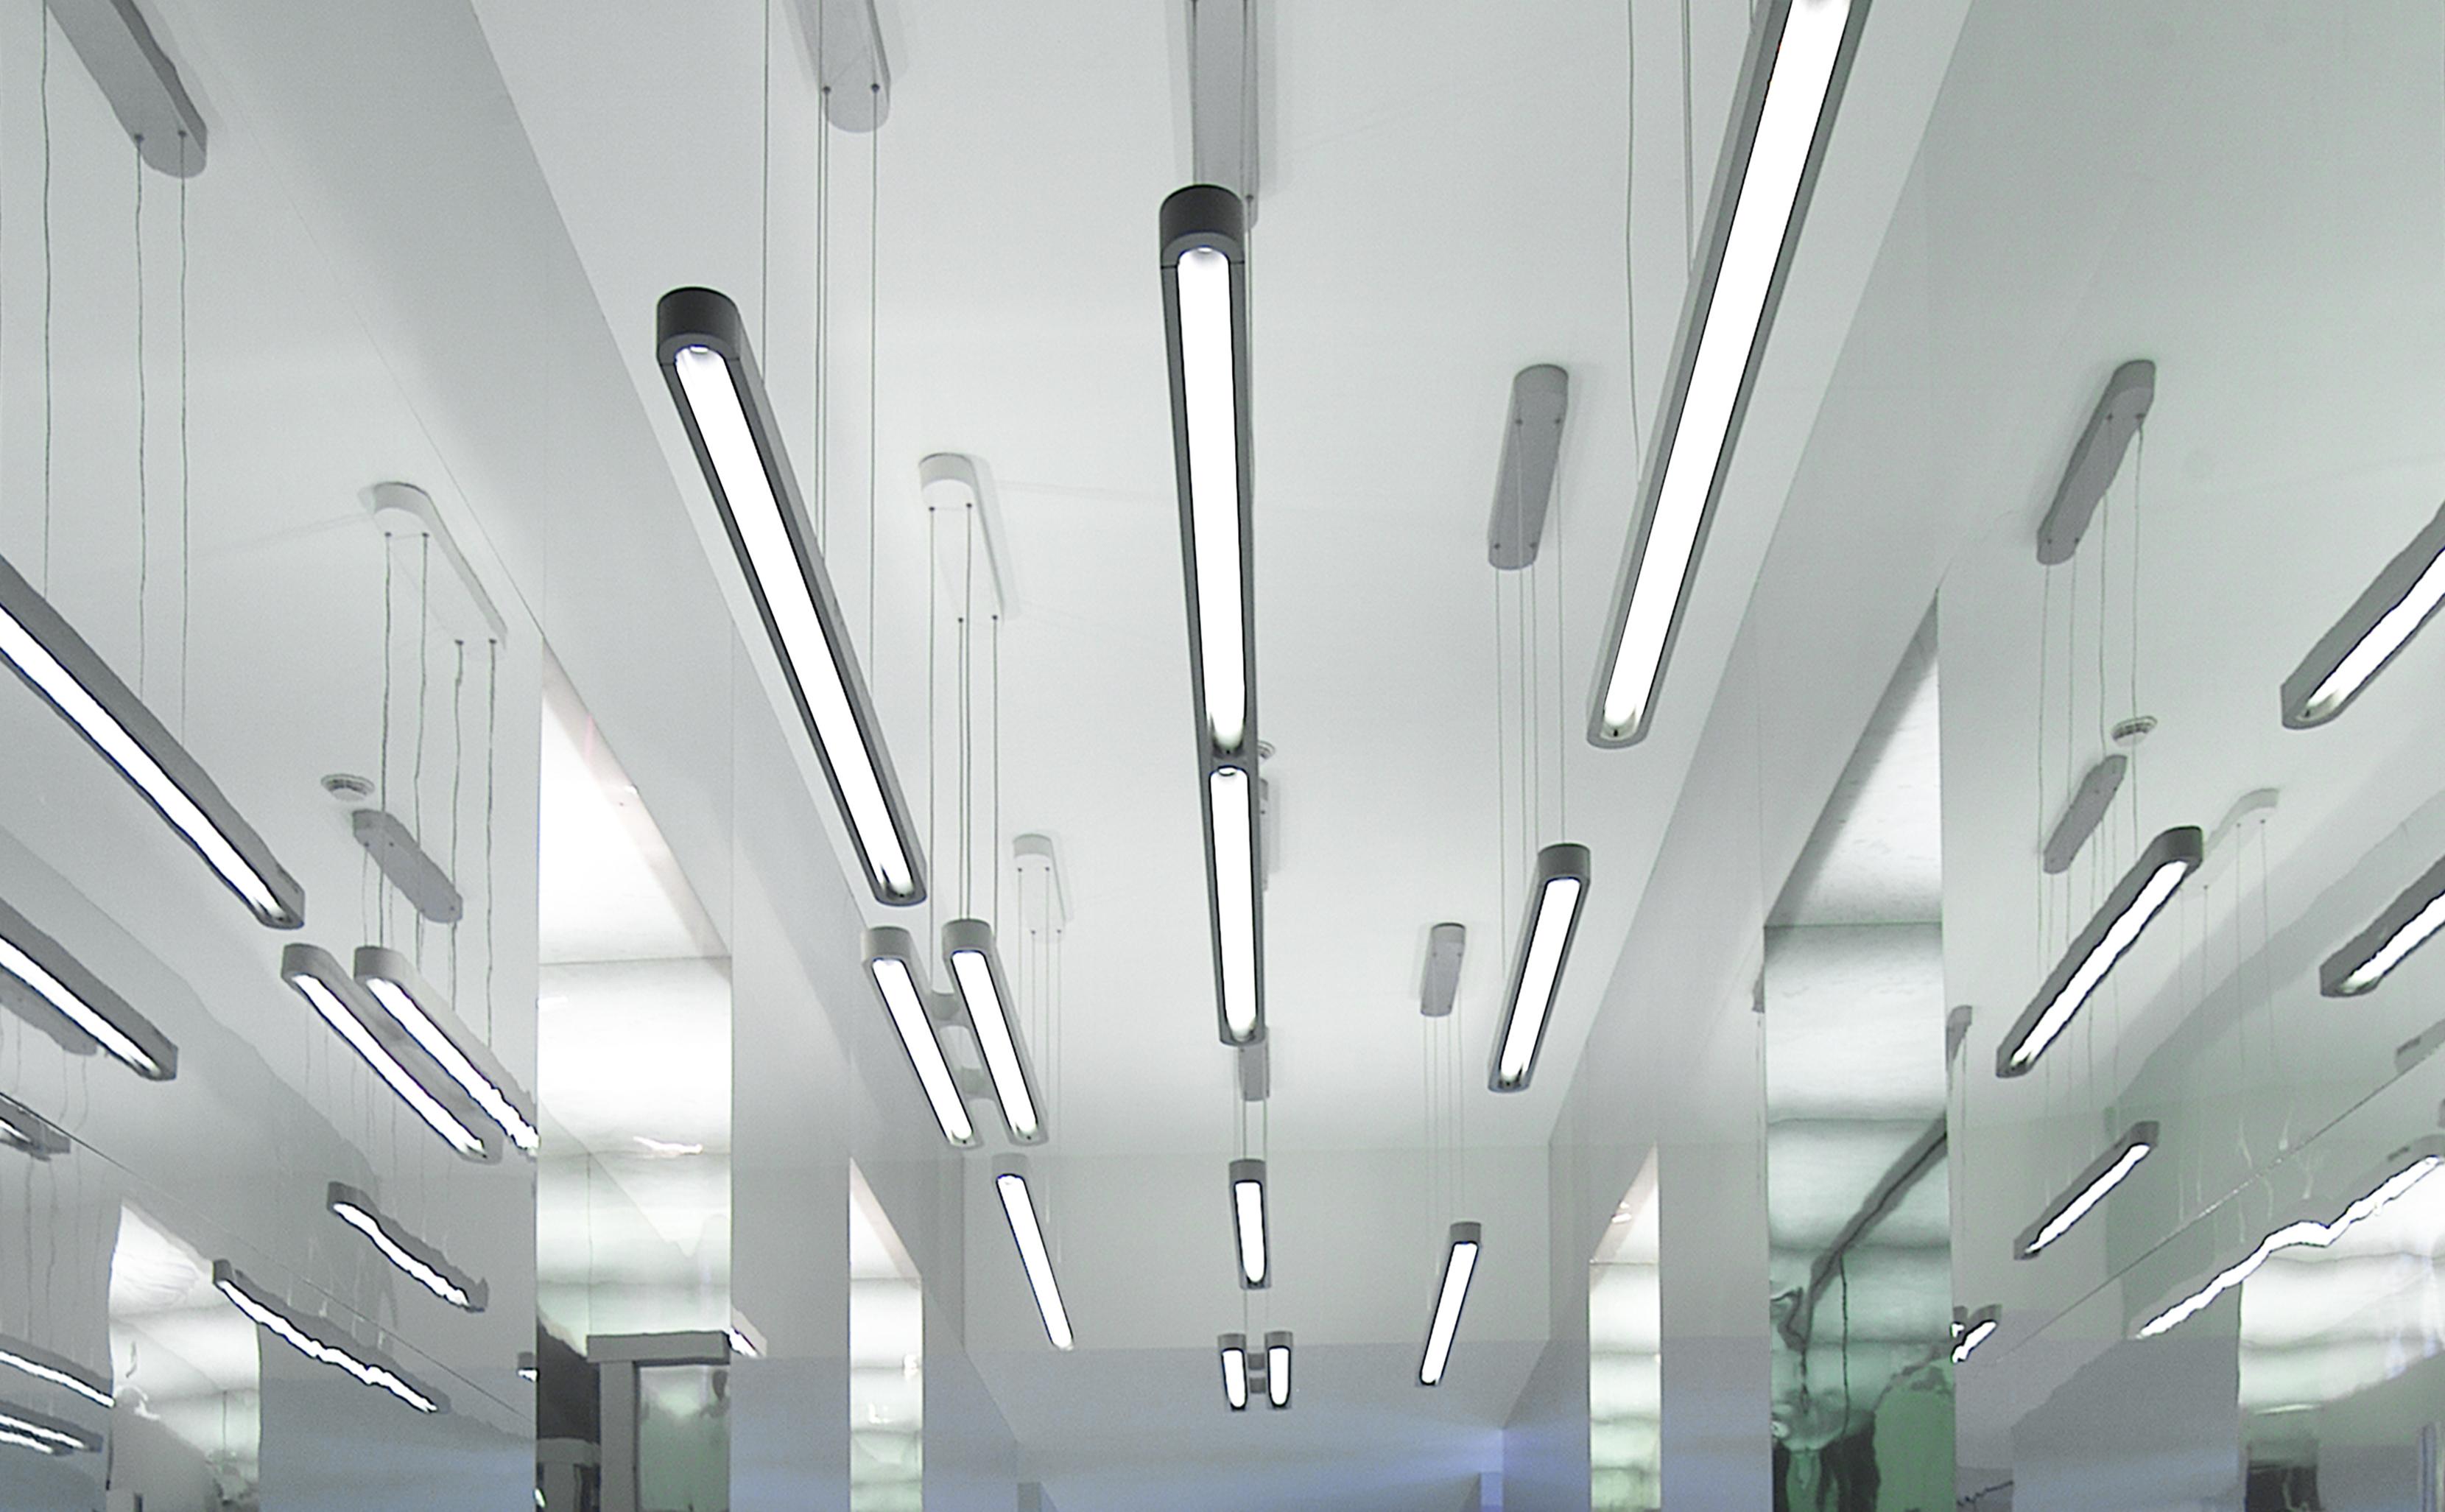 talo lighting range - artemide, 2001-2003